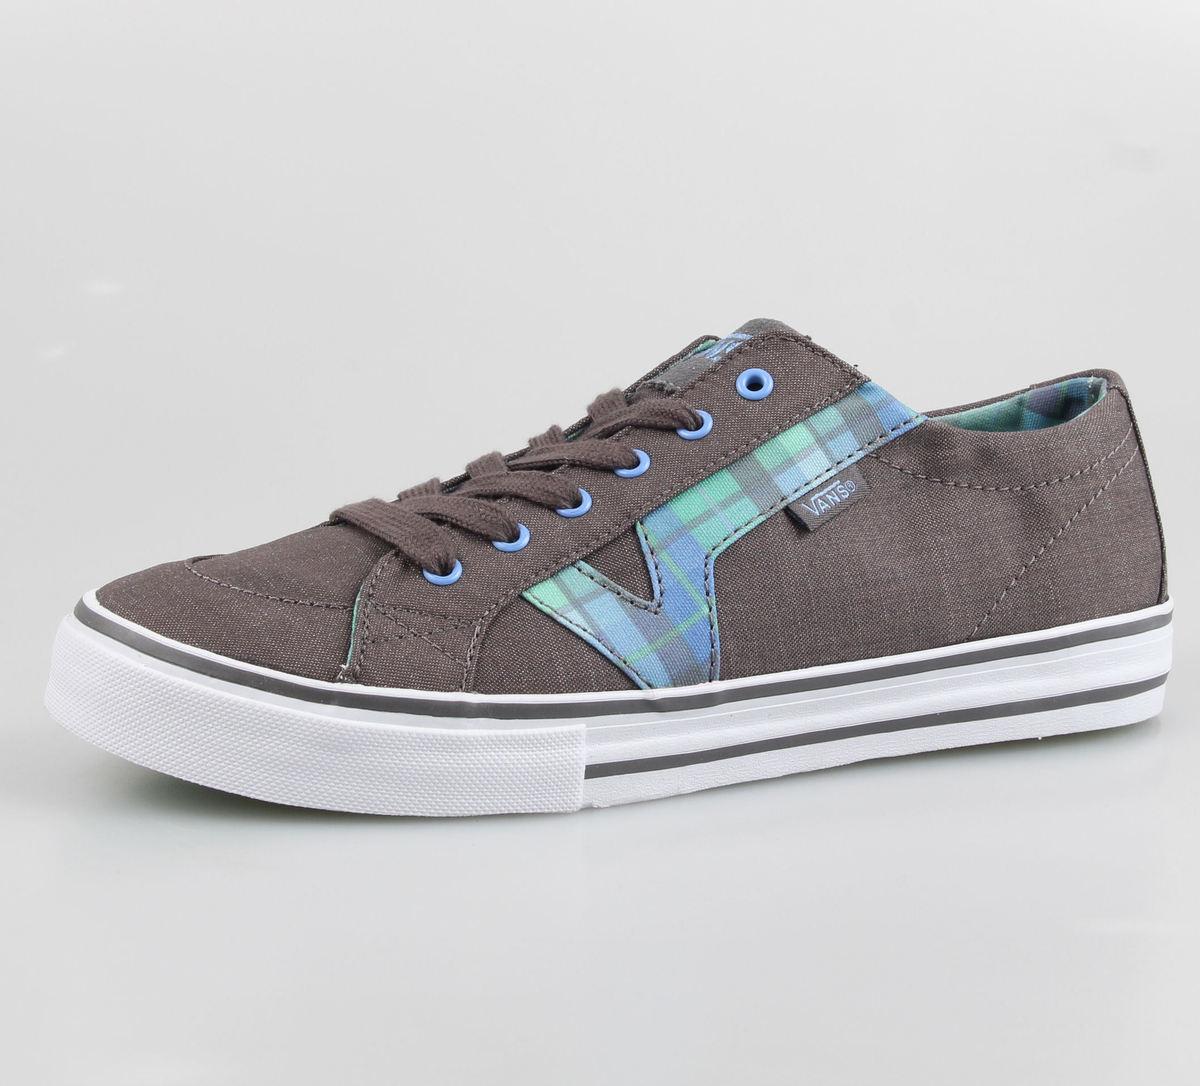 boty dámské VANS - Tory (Plaid) - Grey/Turquoise - VOK670A